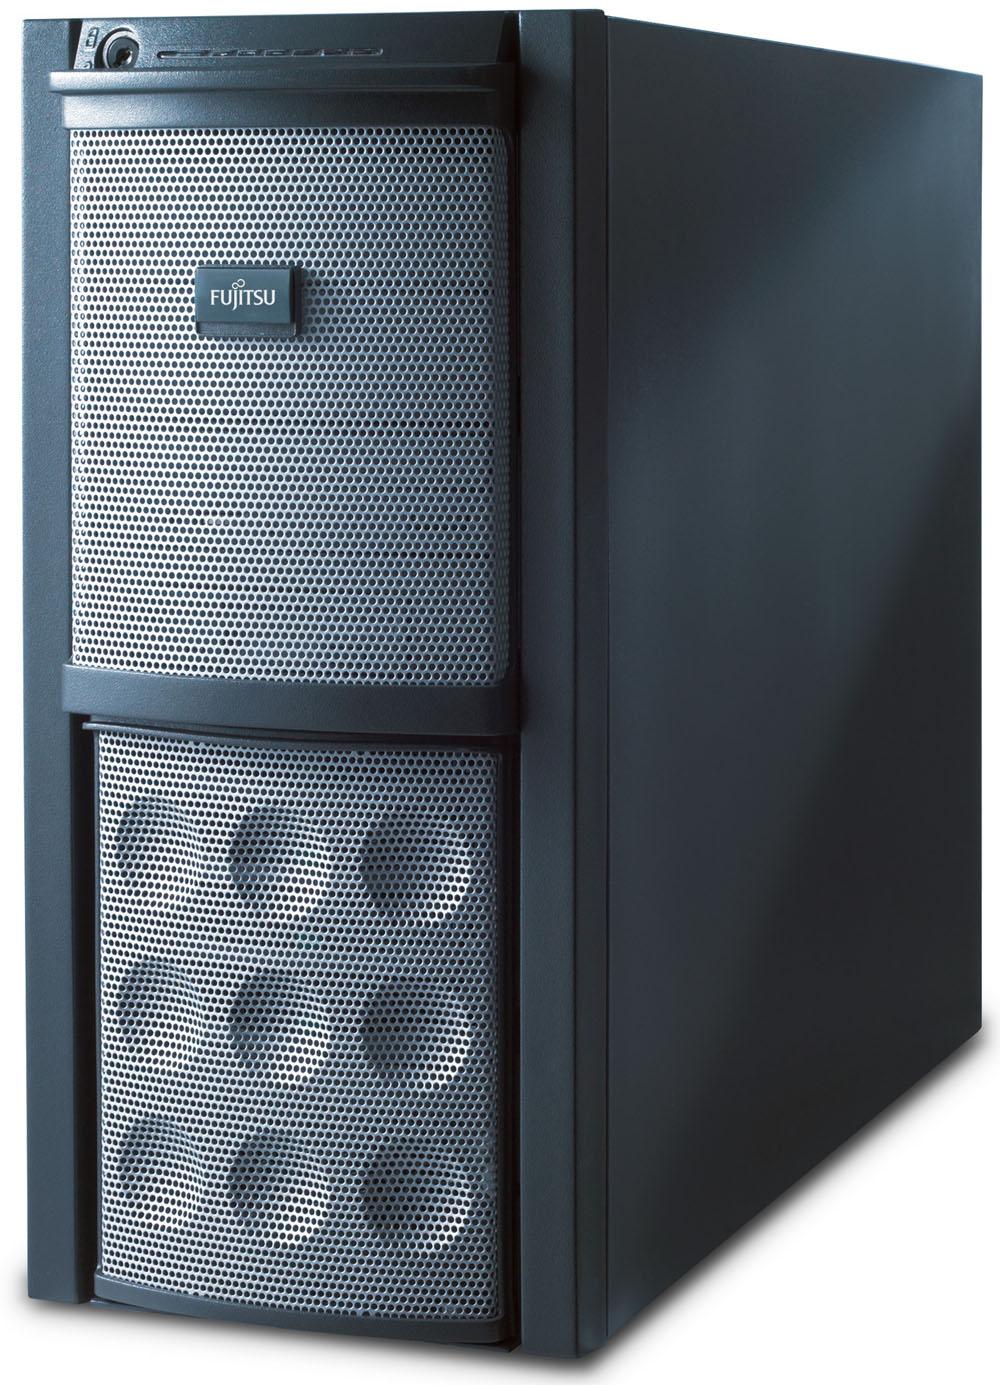 Сервер Fujitsu PRIMERGY TX150 S6 3065 (Tower X2.33GHzDC(4M), 1x1G, SATA RAID 0, 1, 10, no 3,5'HP HDD(4), DVDRWnoFDD, iRMC2, GigEth)